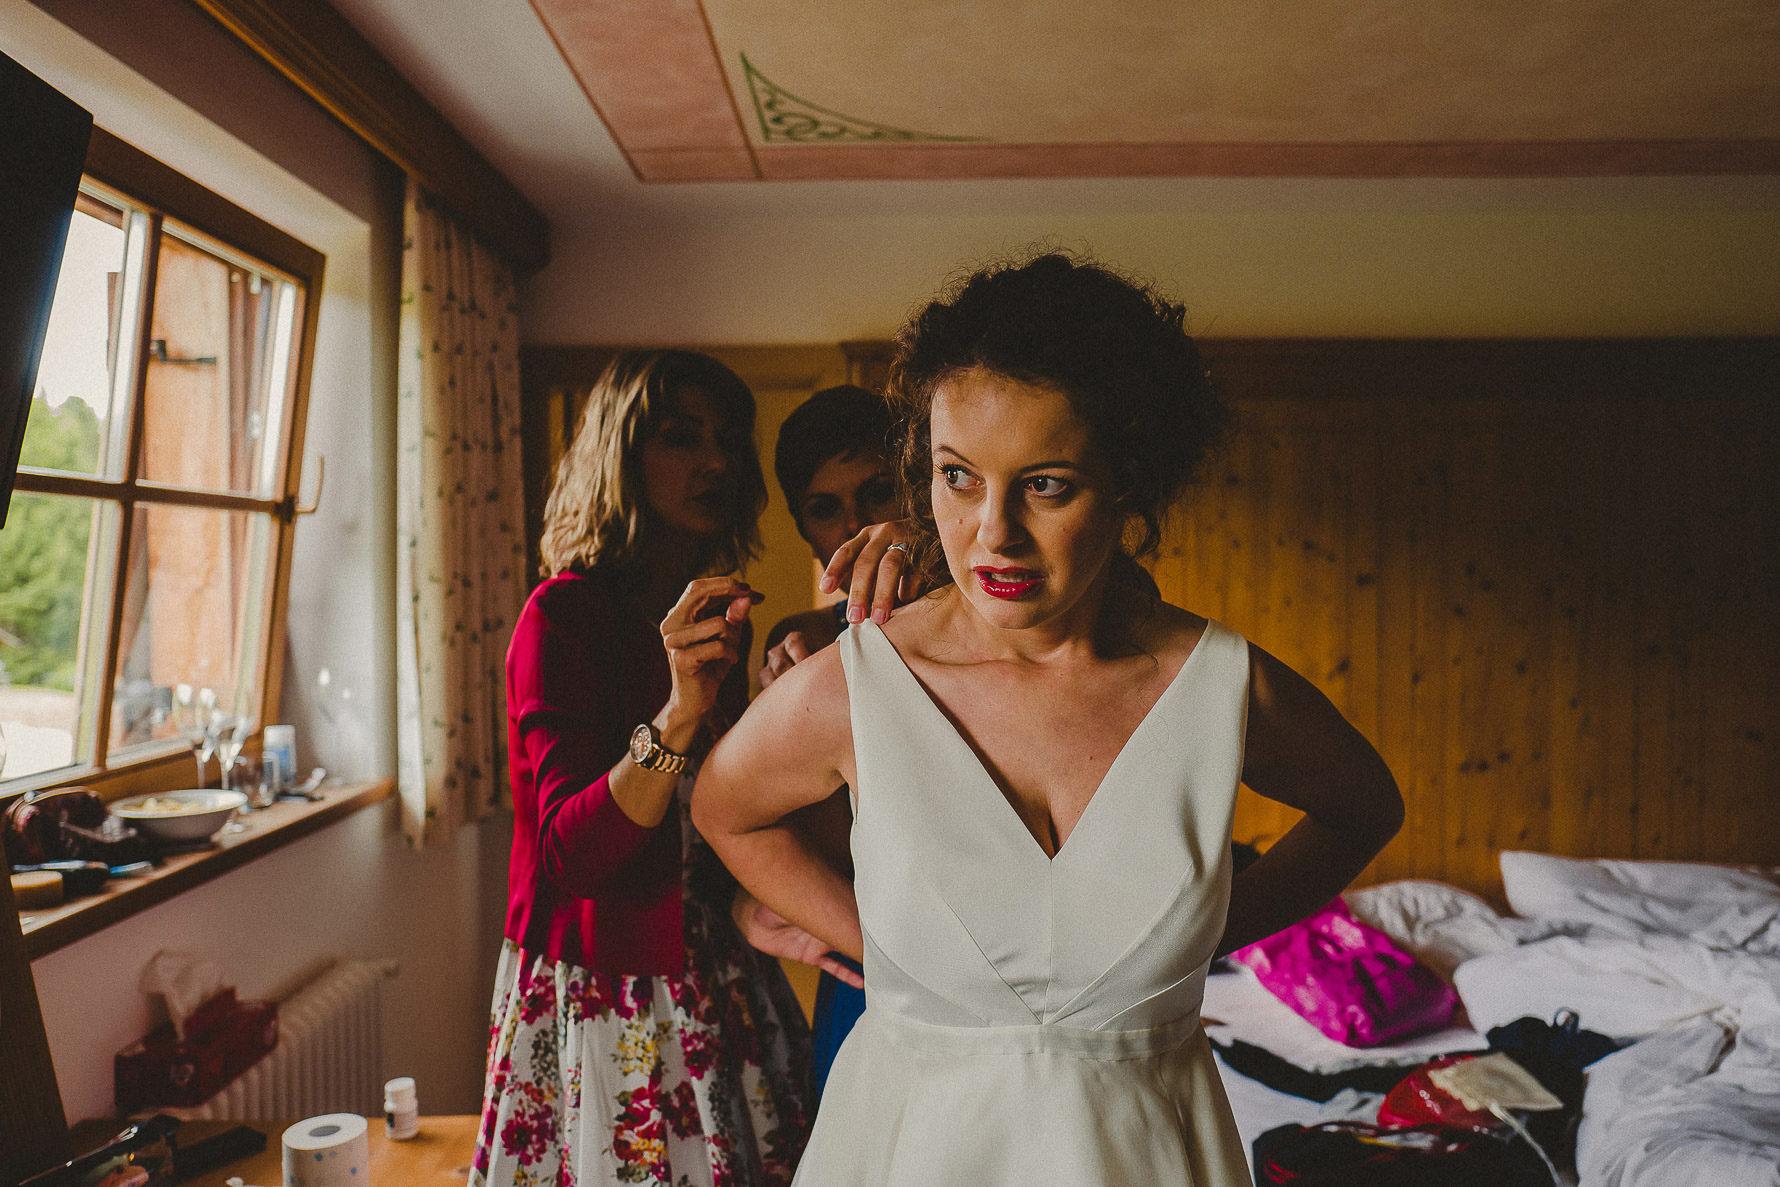 Livio-Lacurre-italian-wedding-photographer-in-sudtirol